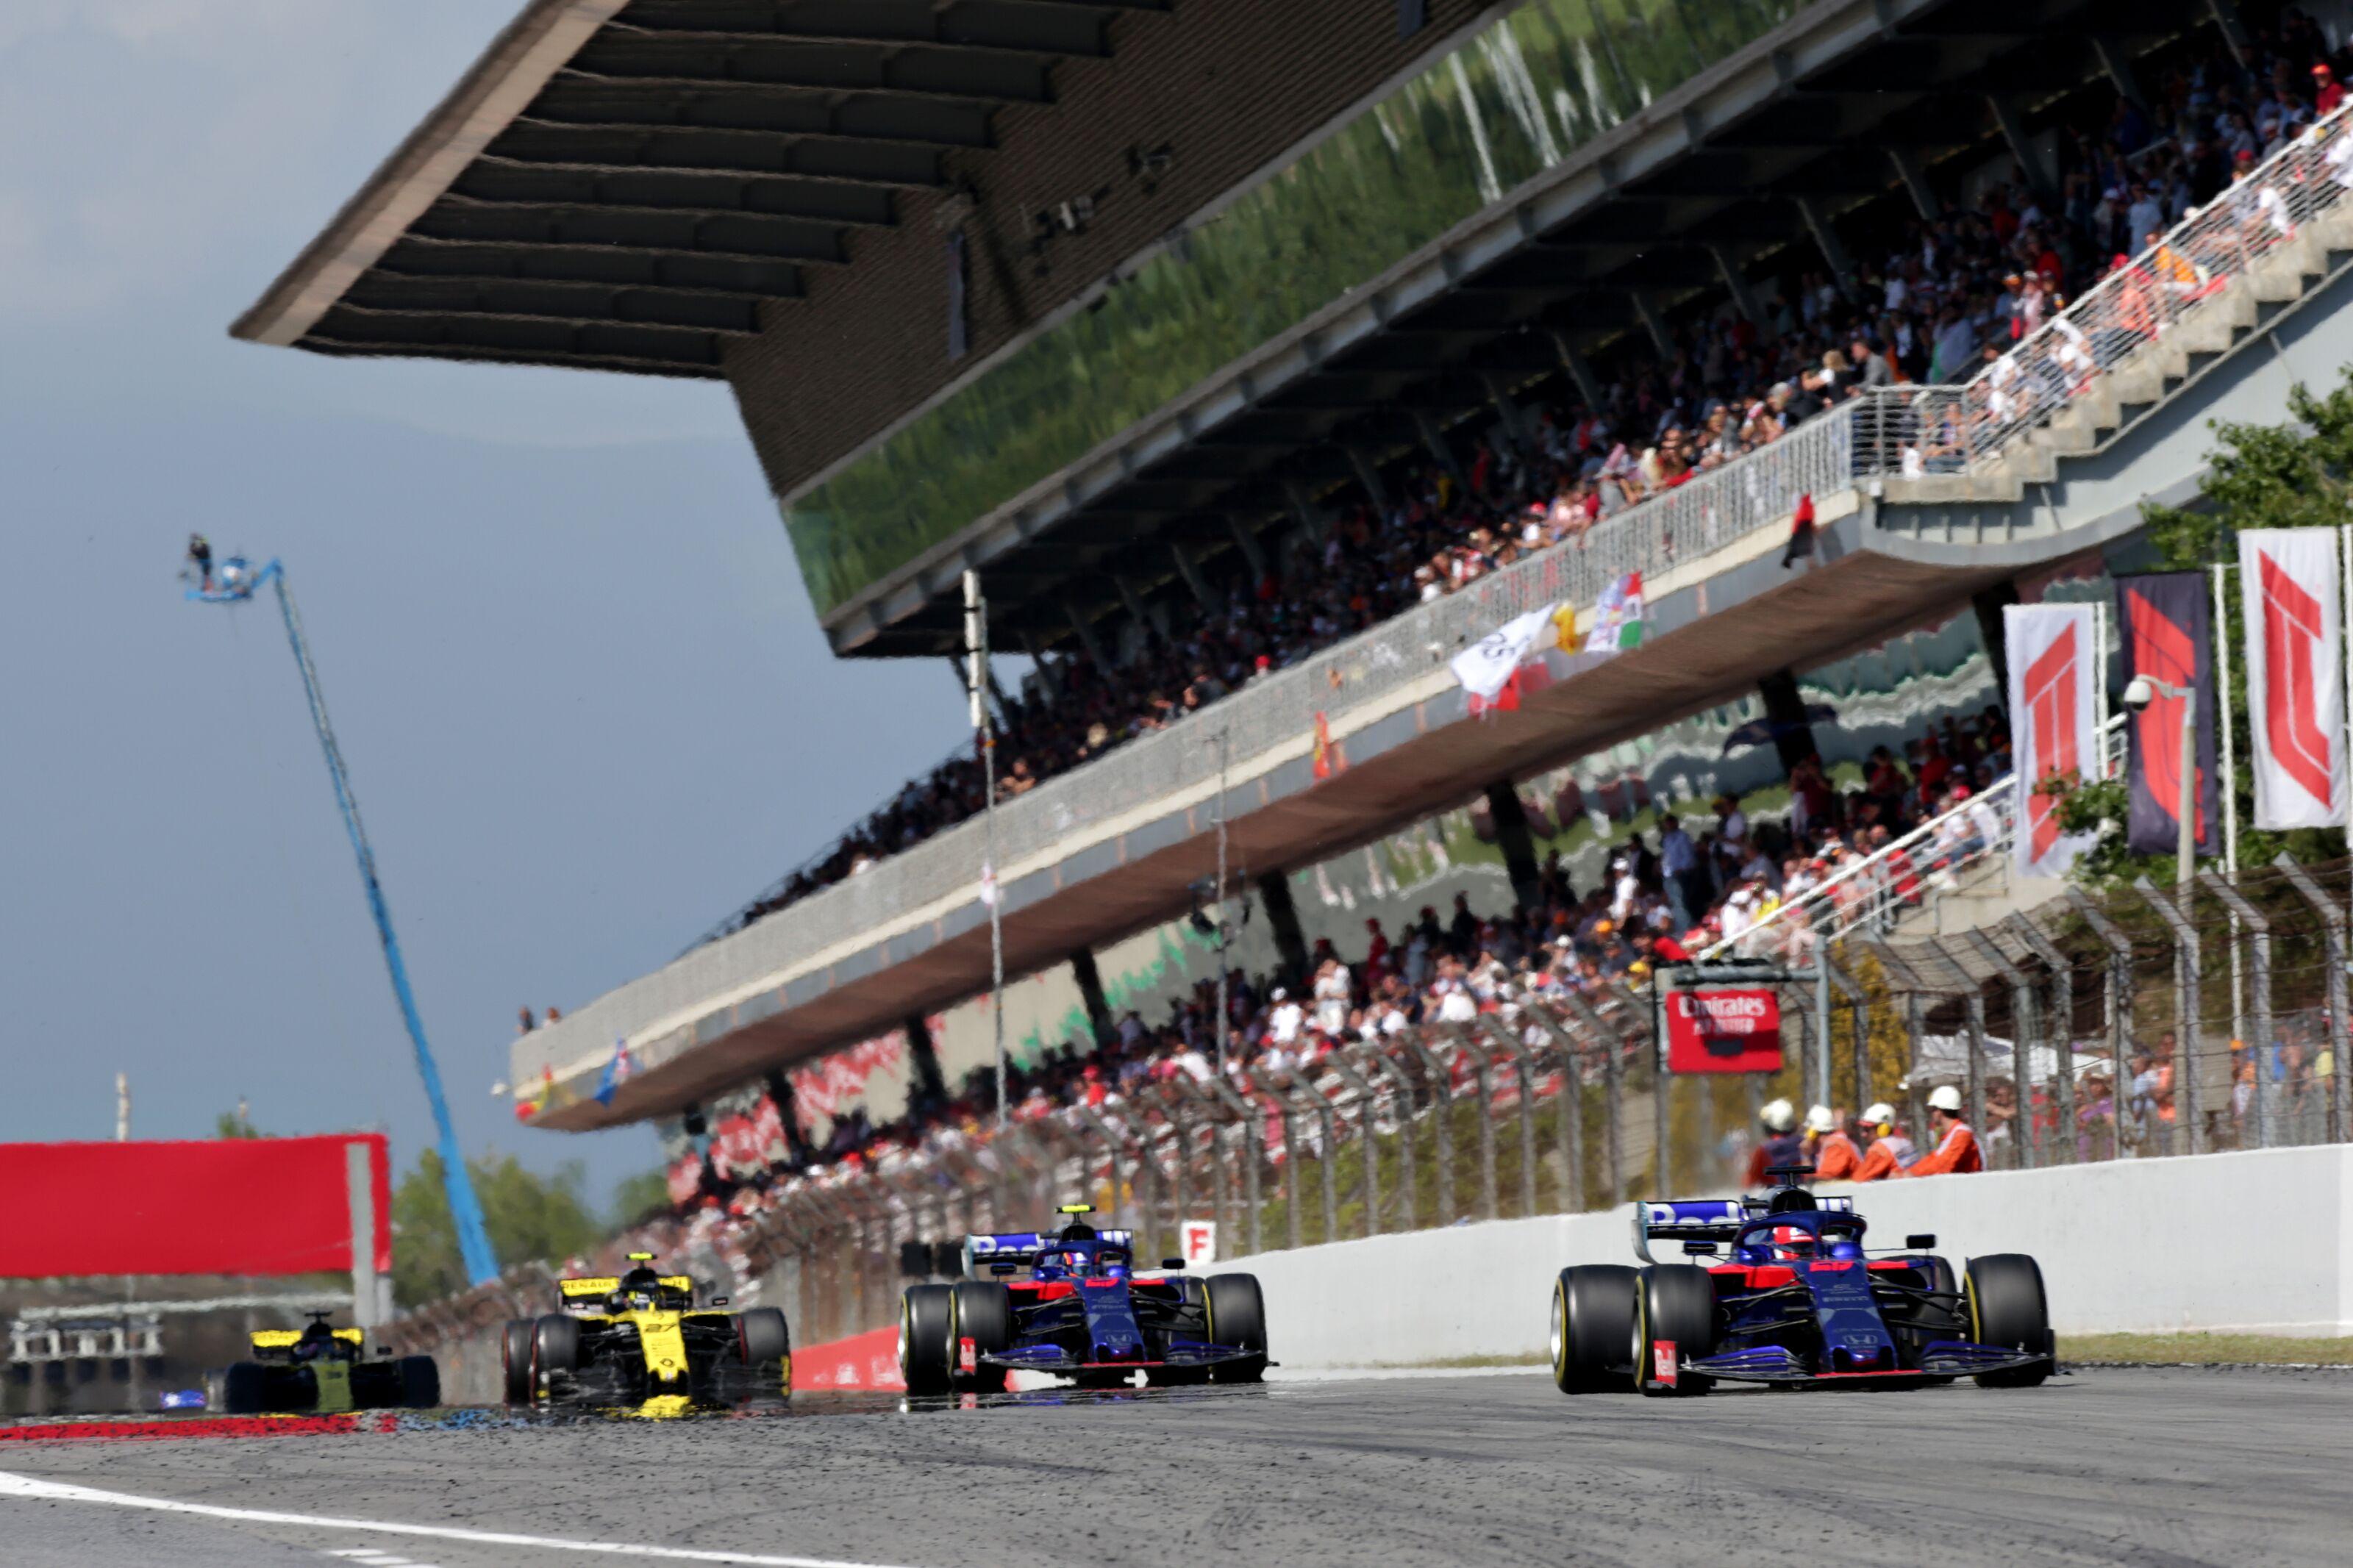 Formula 1: Spanish Grand Prix to return to Circuit de Barcelona-Catalunya in 2020